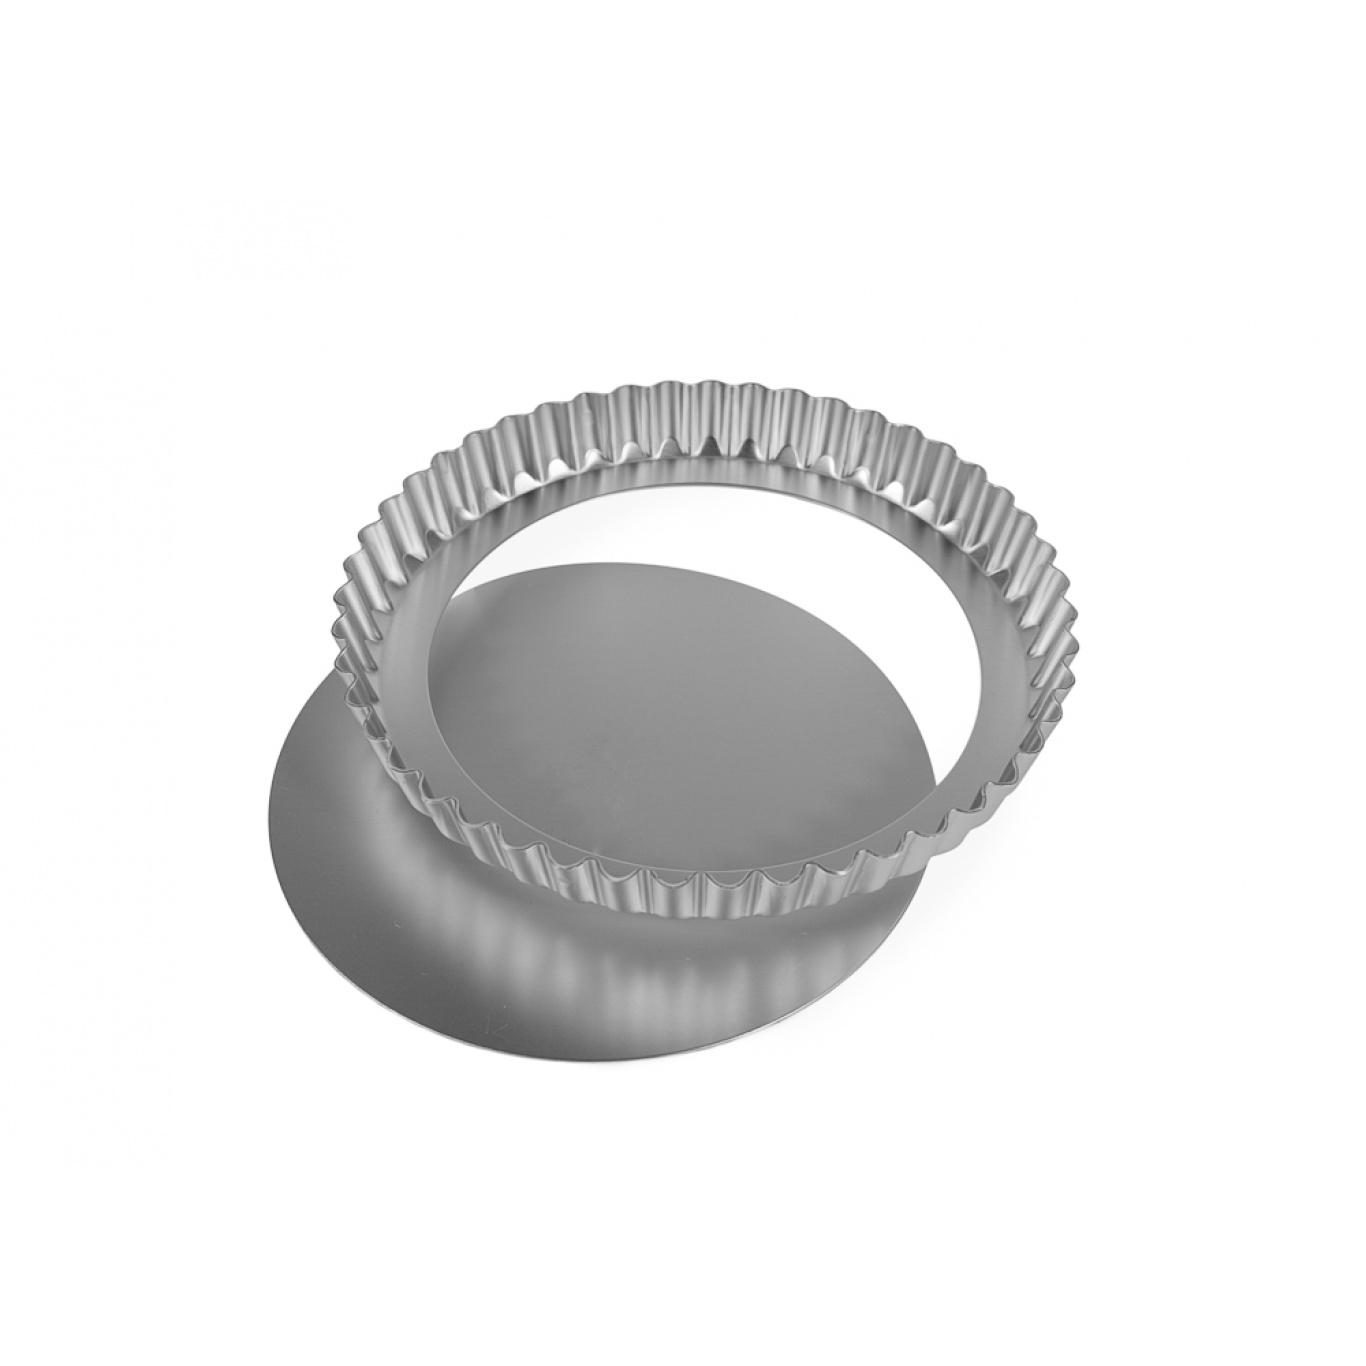 Image of Silverwood Continental Flan Tin Loose Base 7.5ins19cm